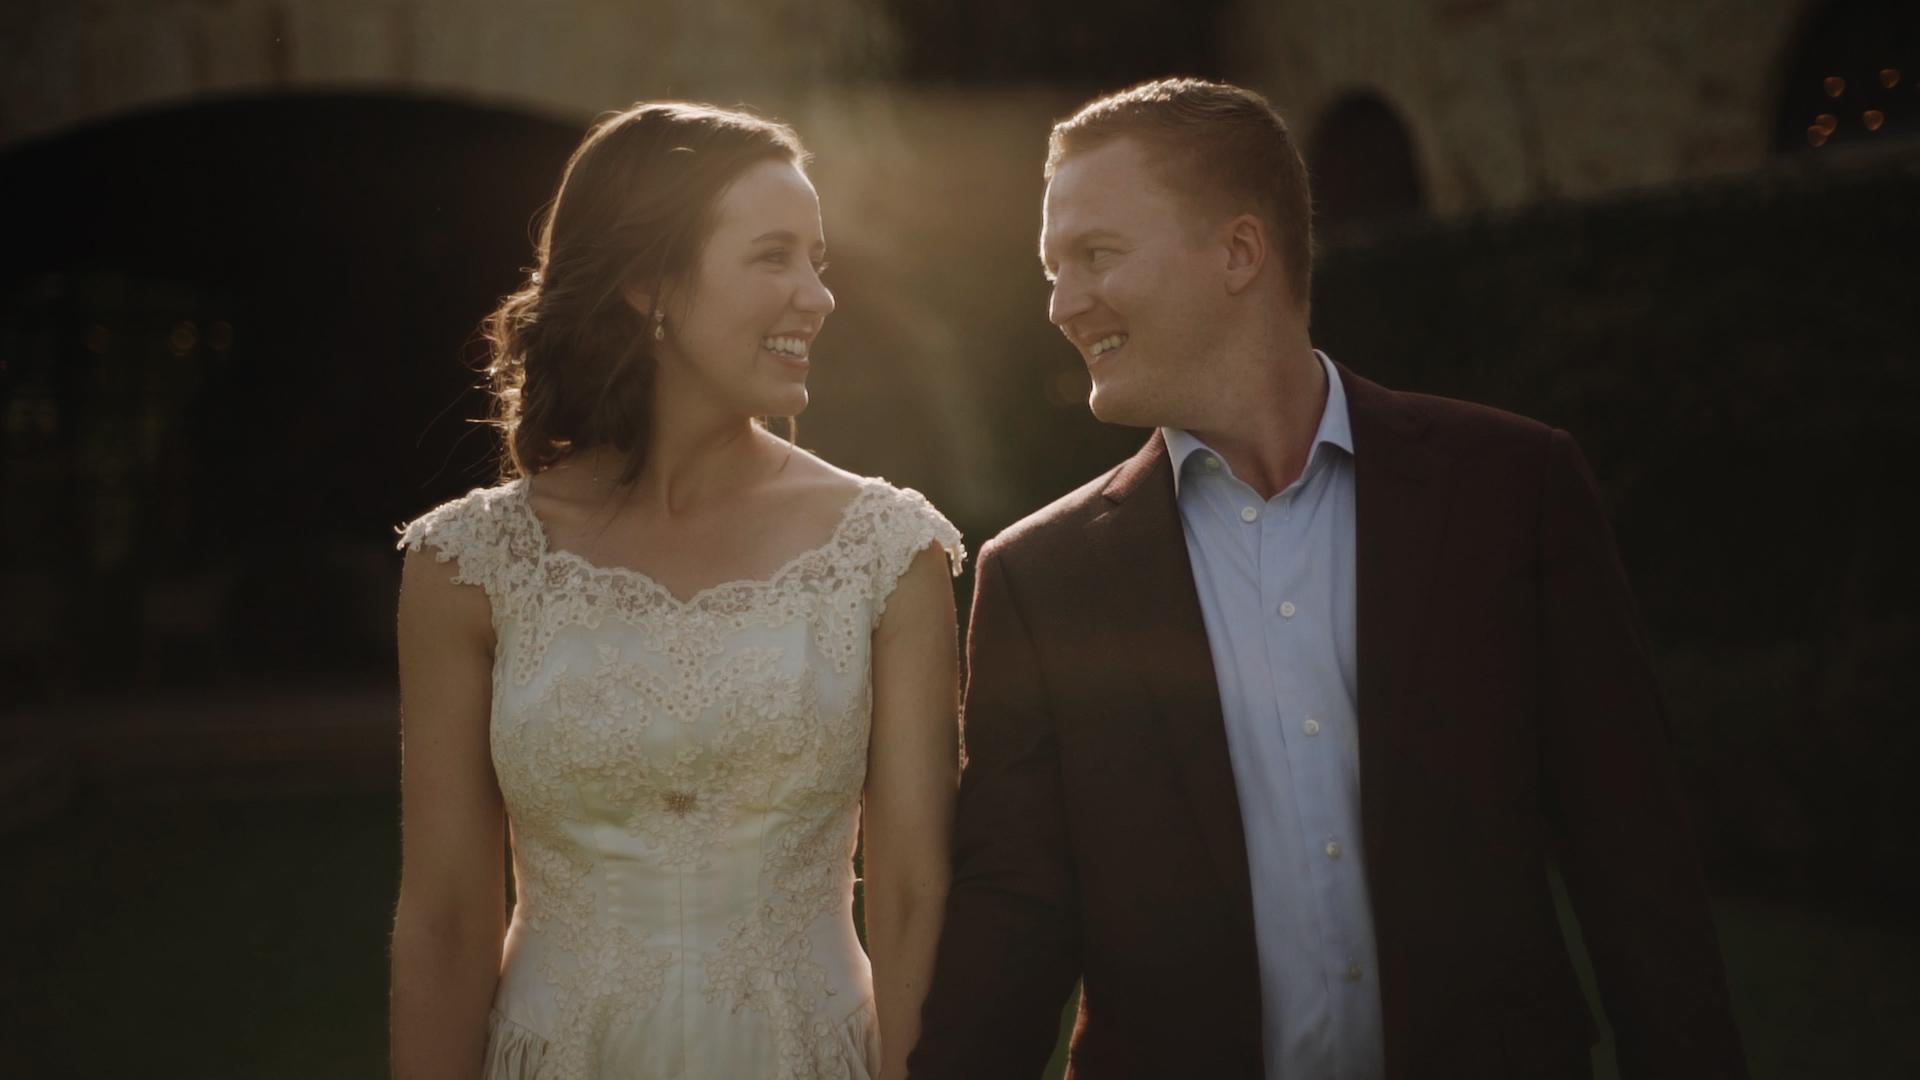 Traci Young Byron Wedding.Fun Love Stories Tv